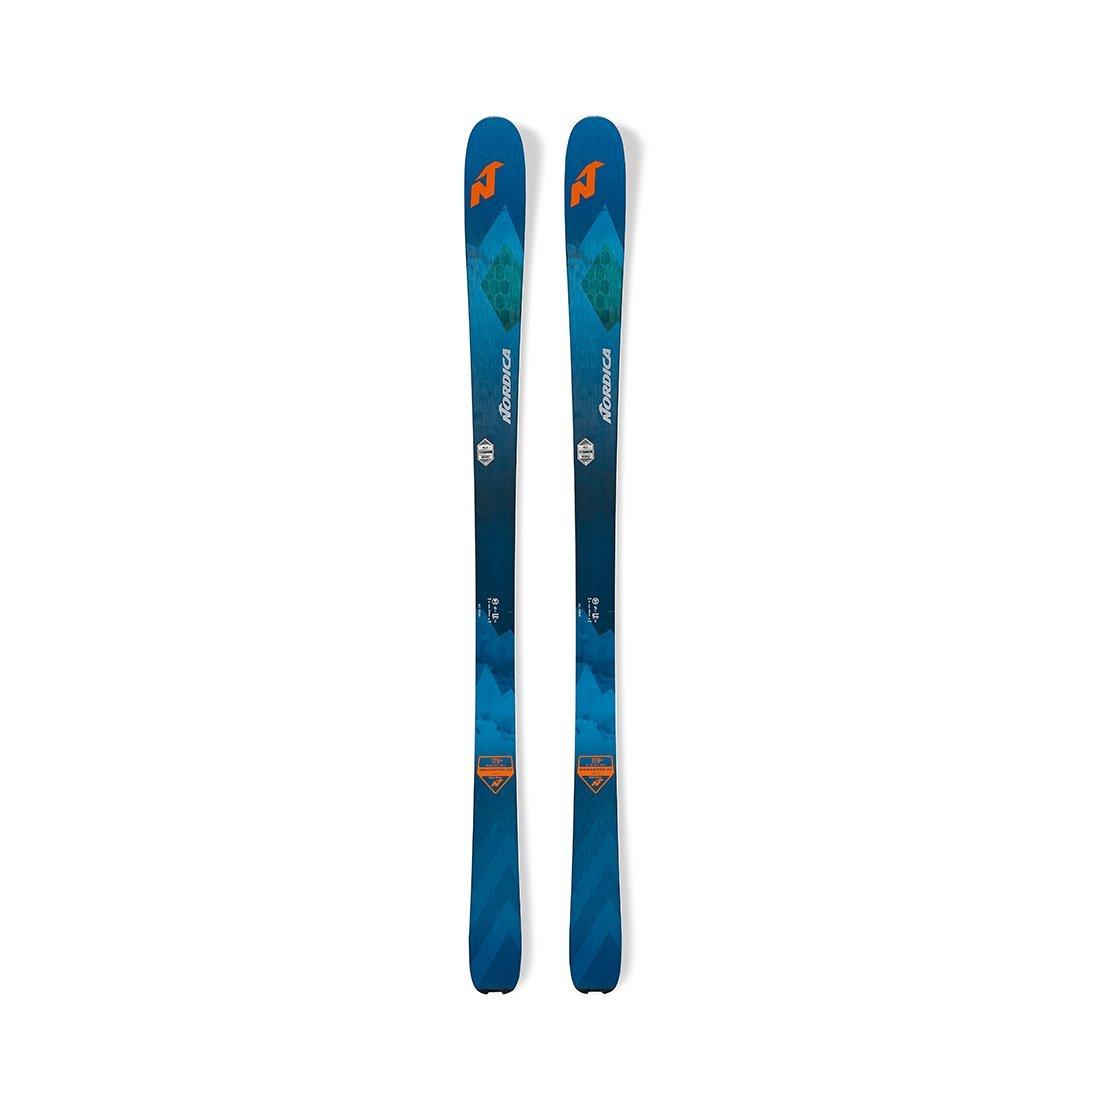 2021 Nordica Navigator 85 Men's Skis